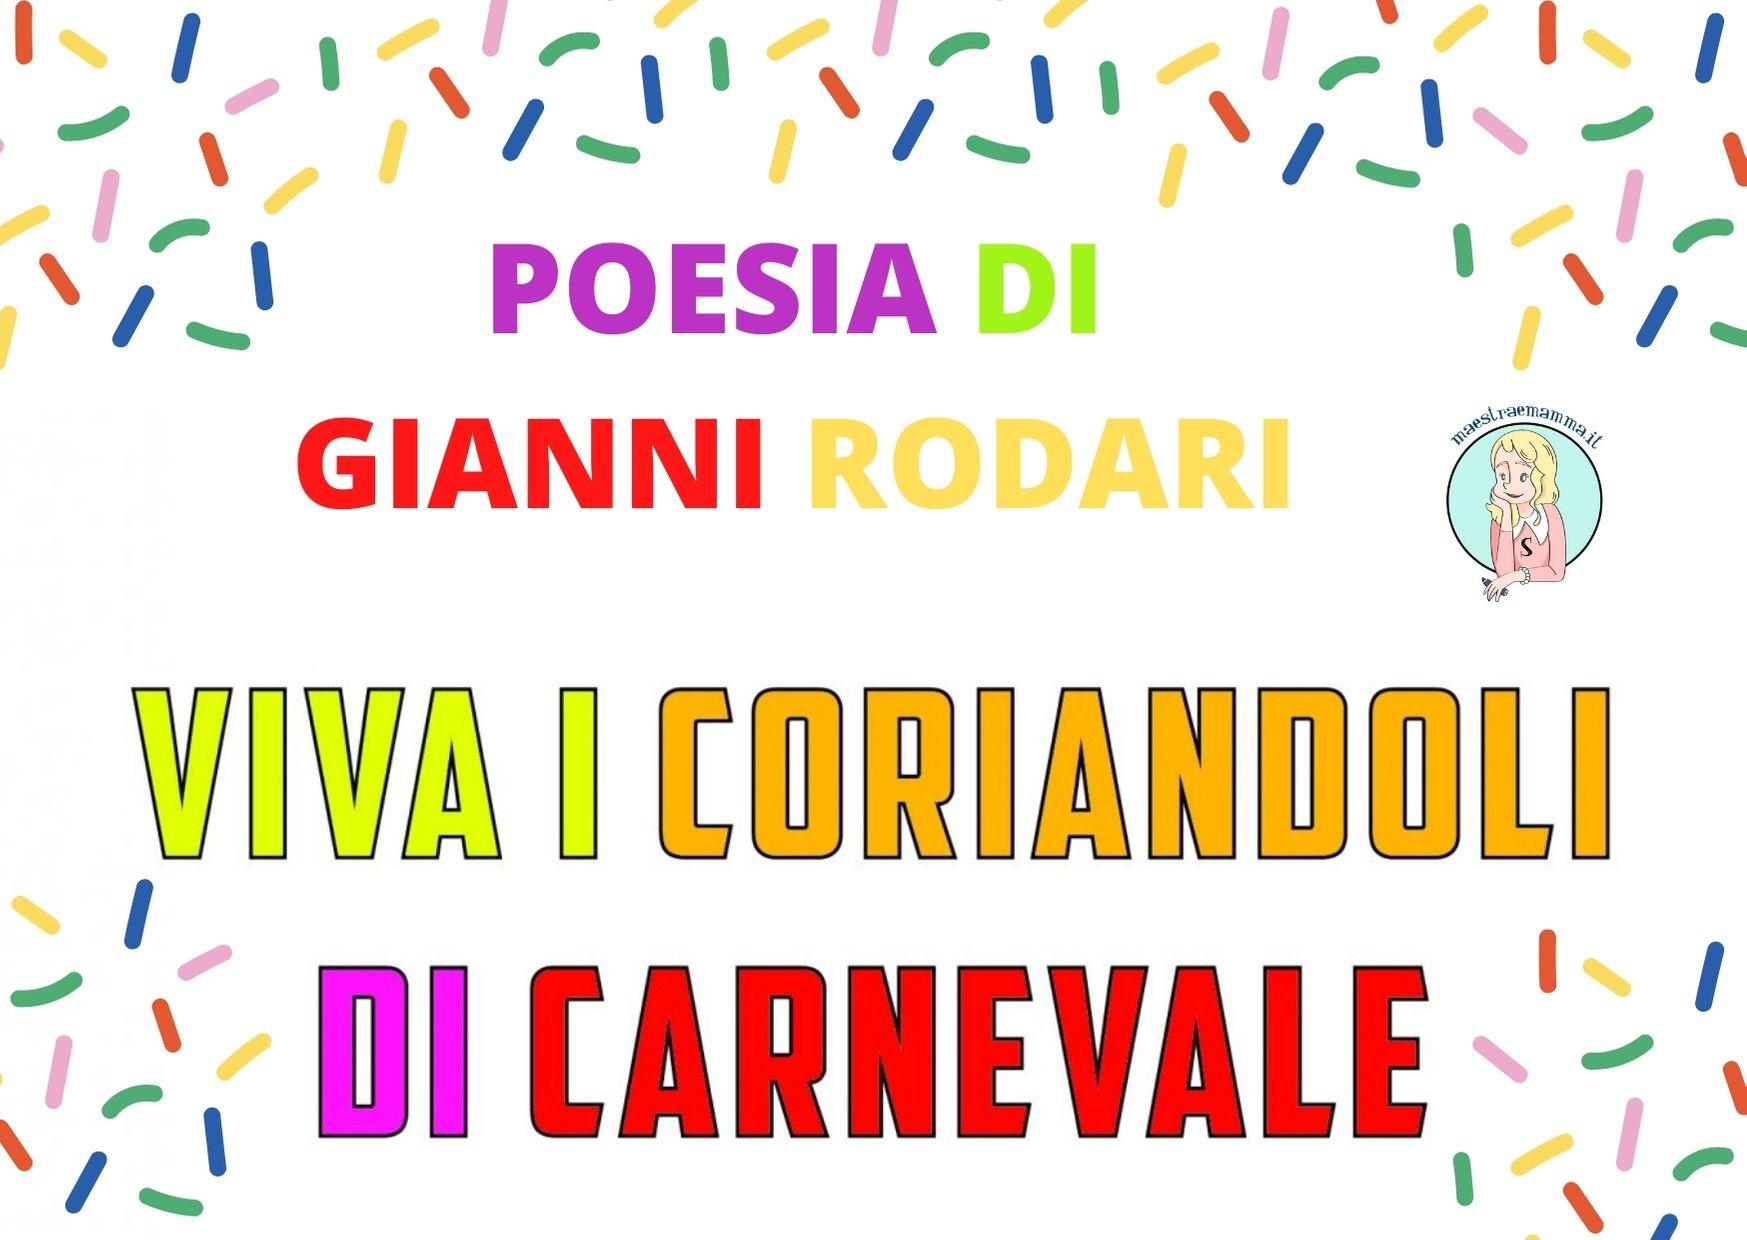 Viva i coriandoli di Carnevale Gianni Rodari – Poesia